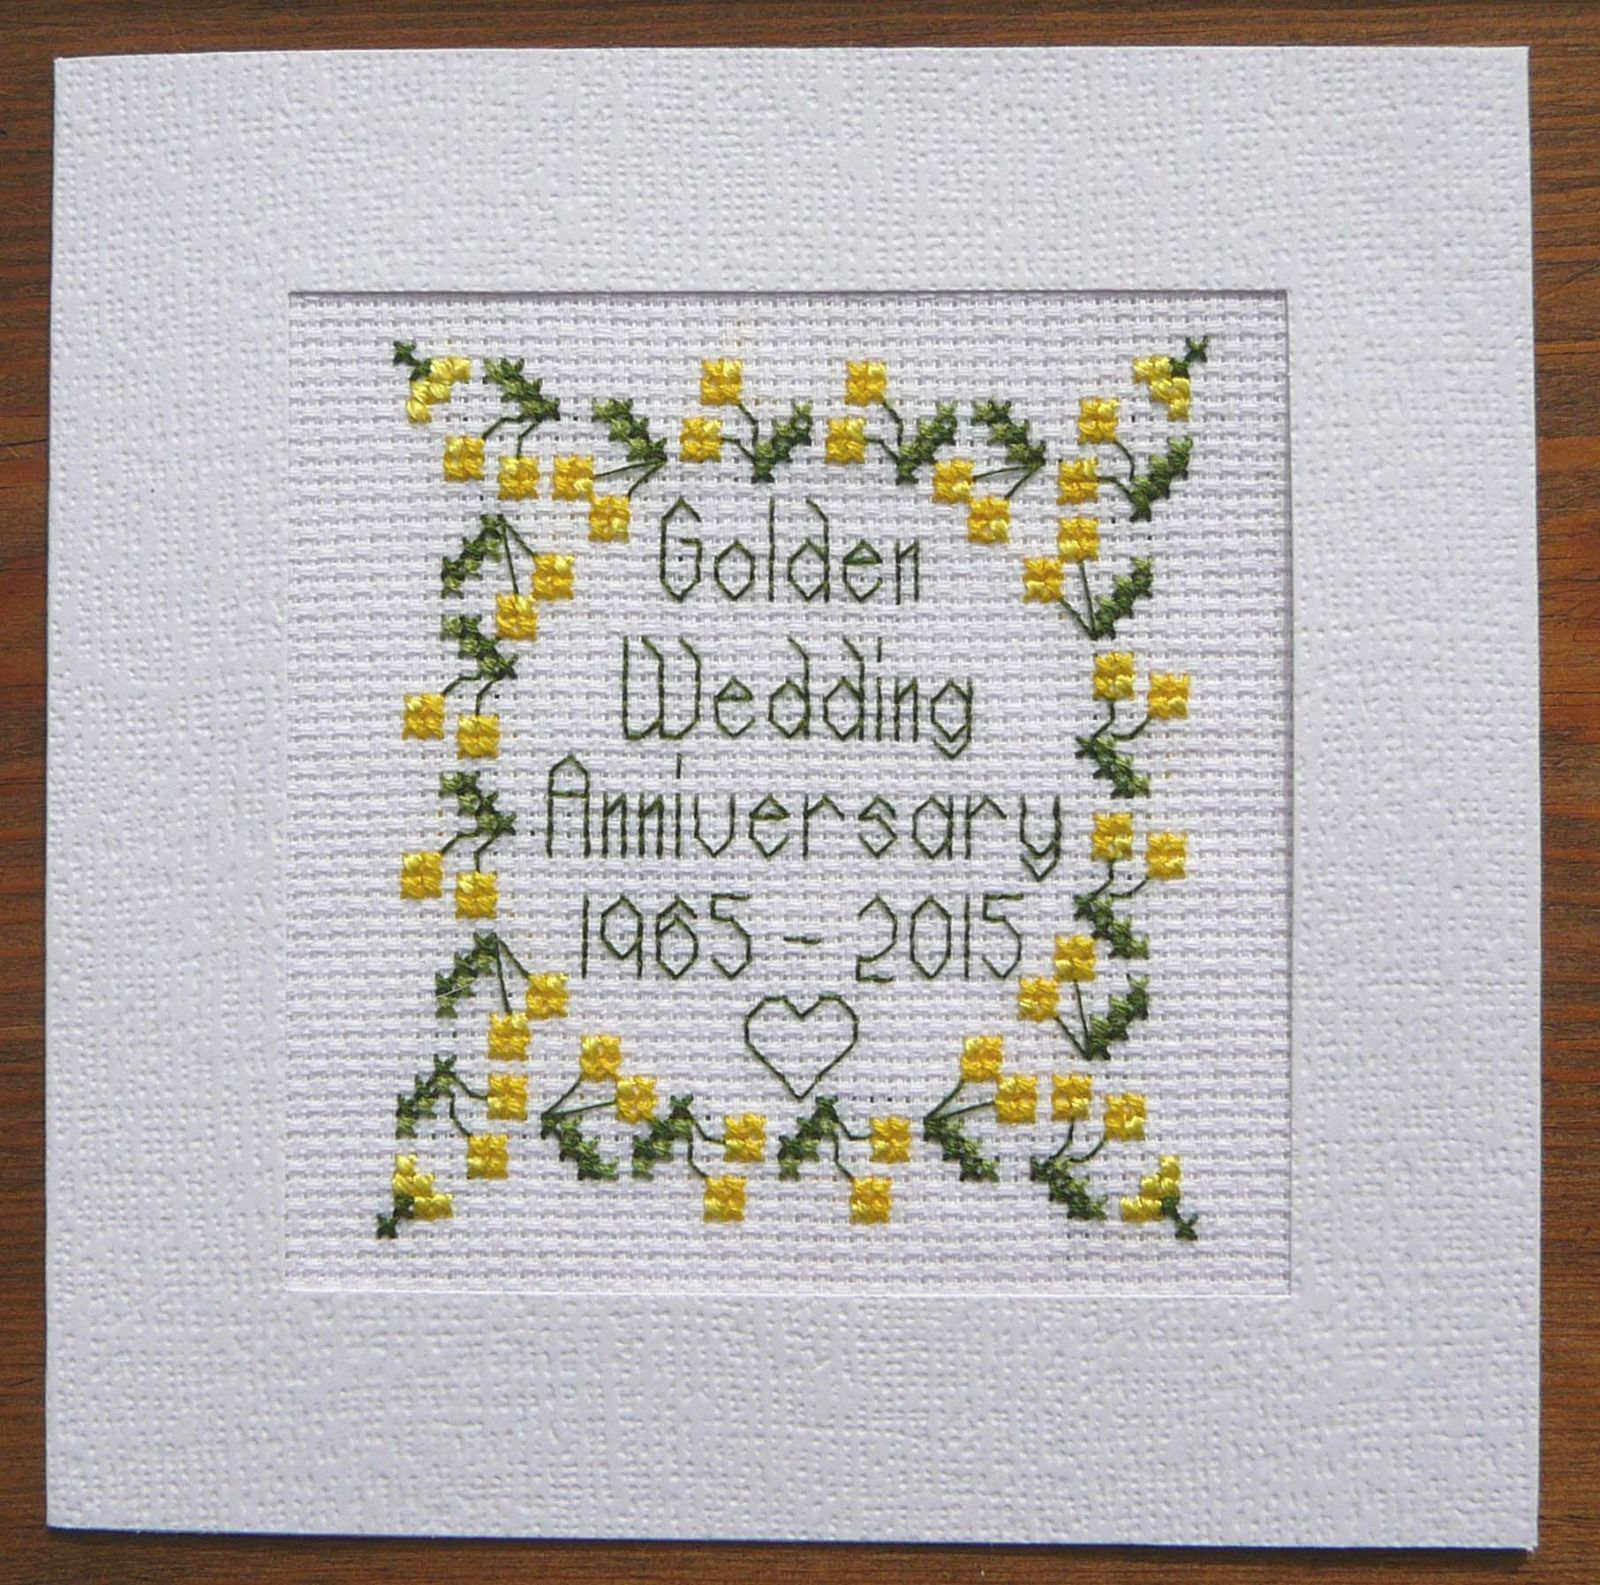 50th Golden Wedding Anniversary Card Cross Stitch Kit 100 Cotton Adia L011 Wedding Cross Stitch Cross Stitch Cards Cross Stitch Love